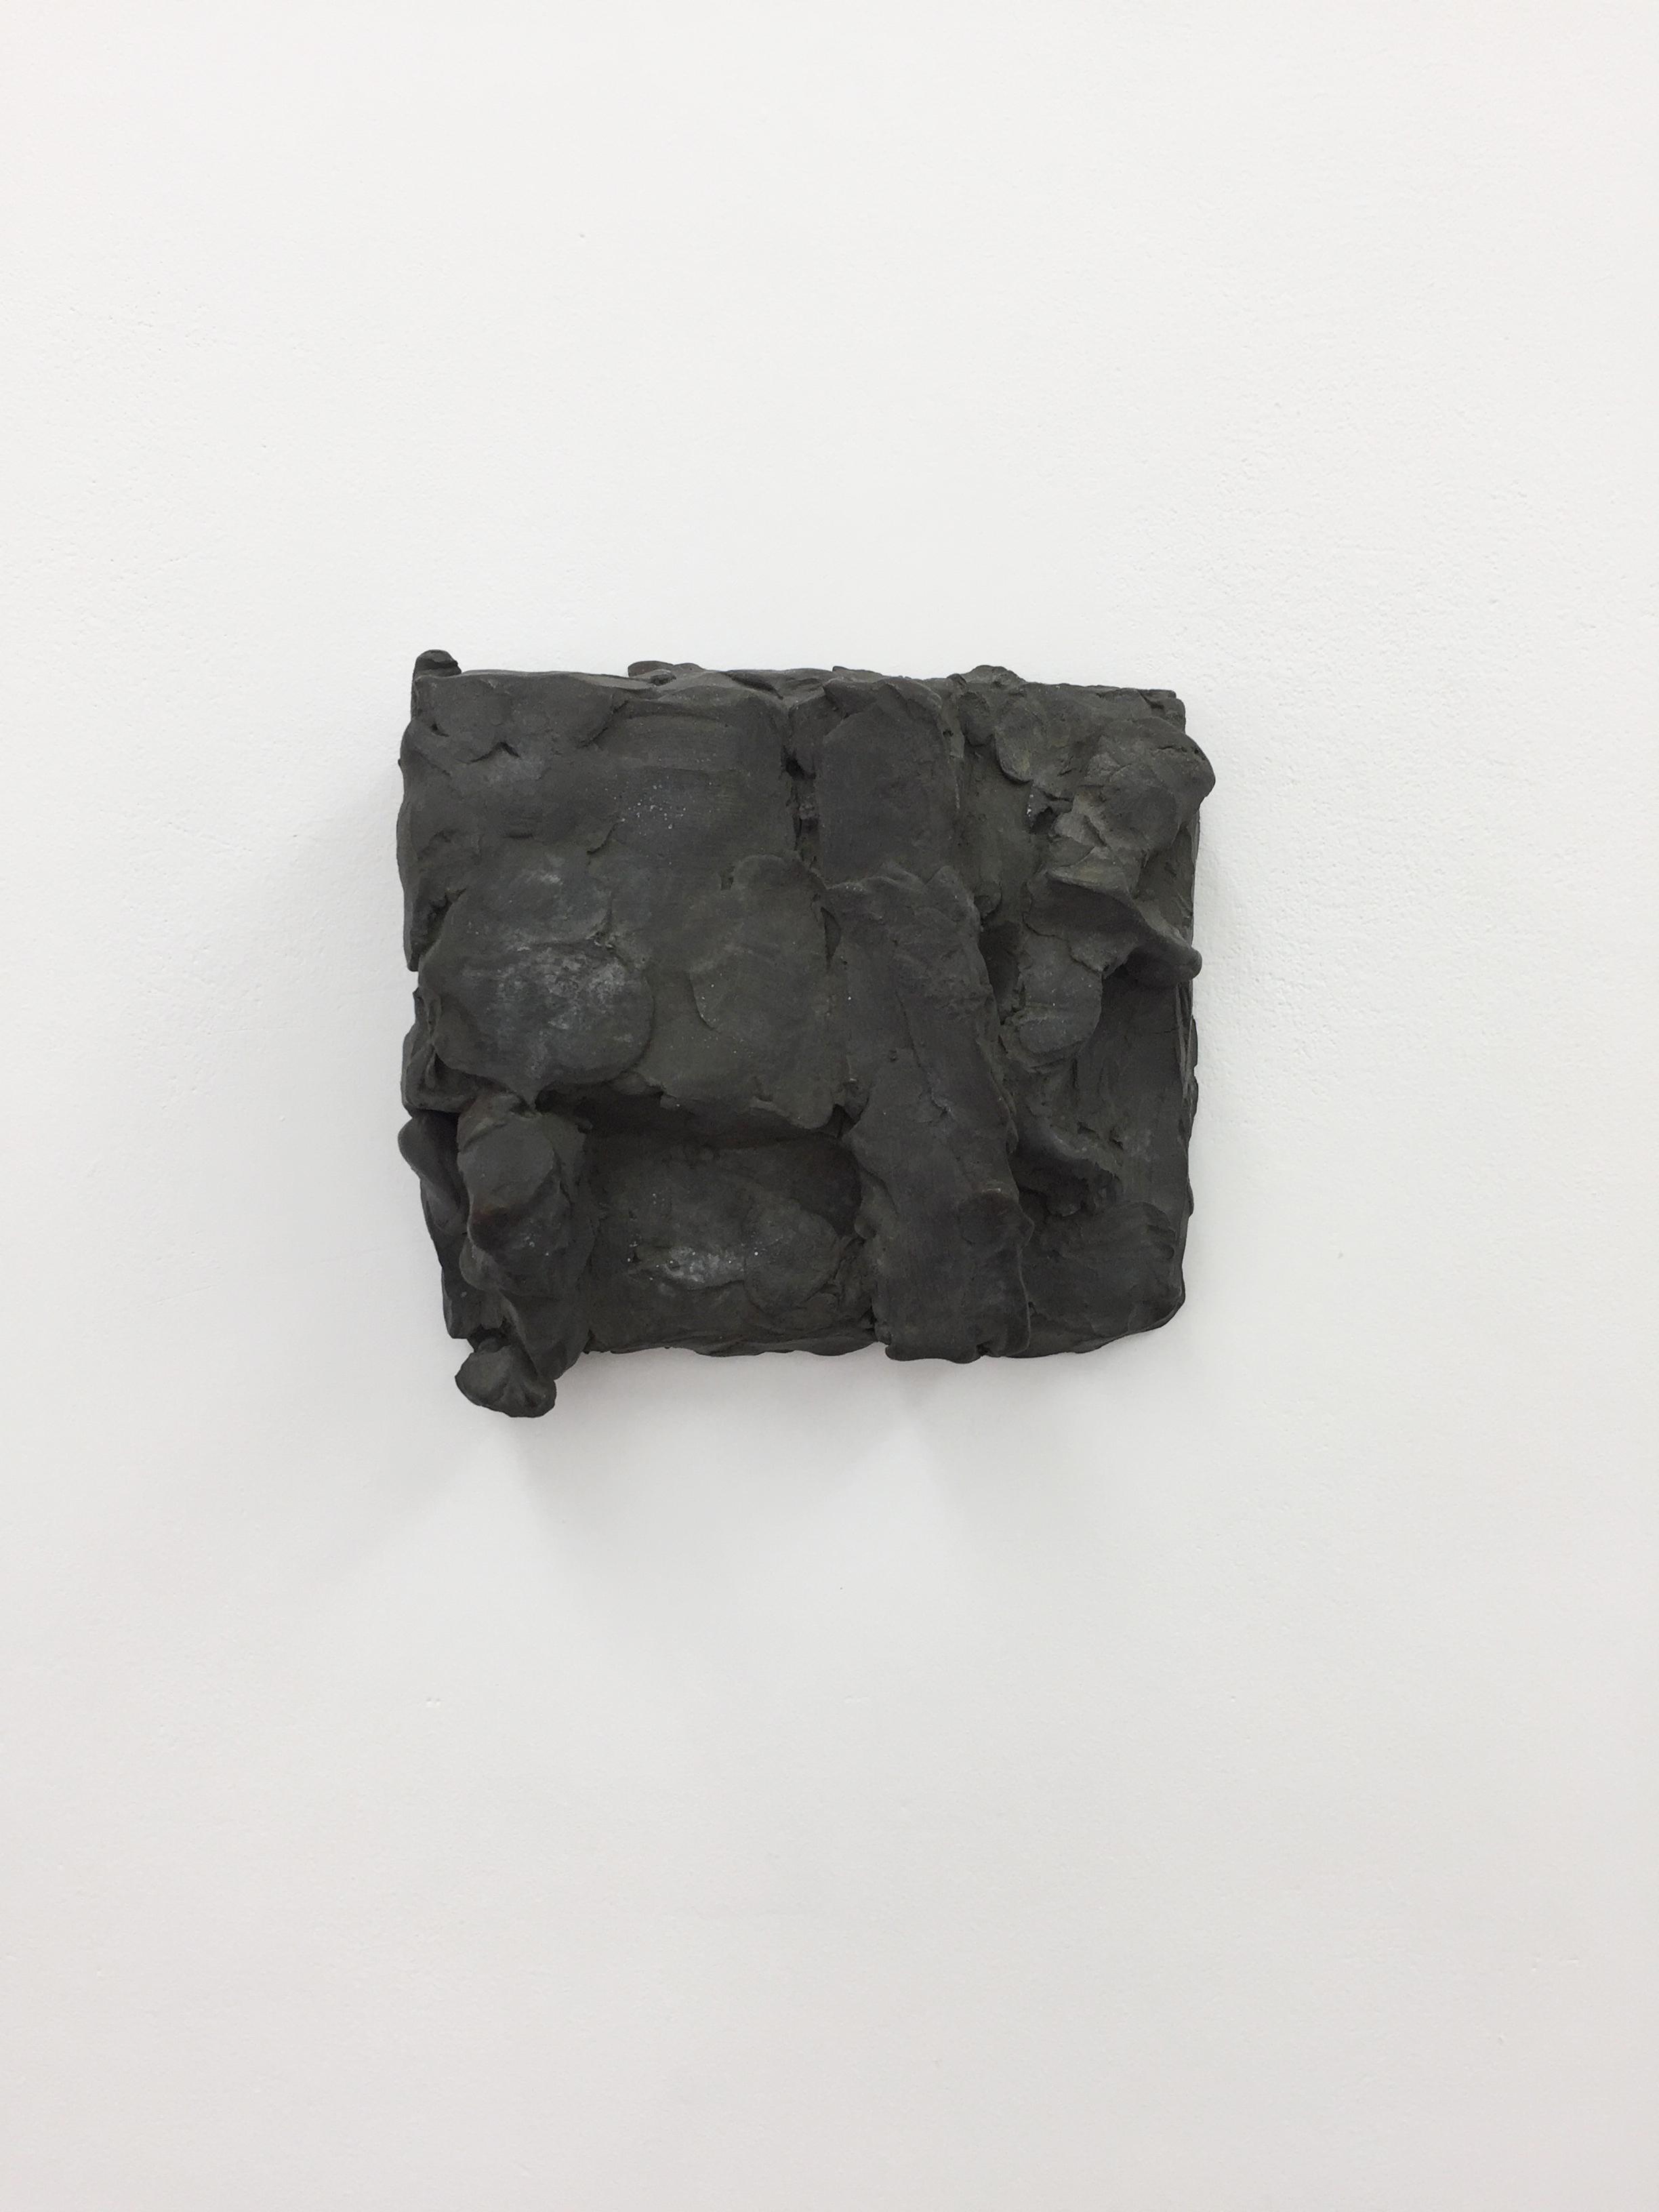 Hans Josephsohn, Untitled, 1997, Relief sketch, Brass, 13 x 14 x 6 cm